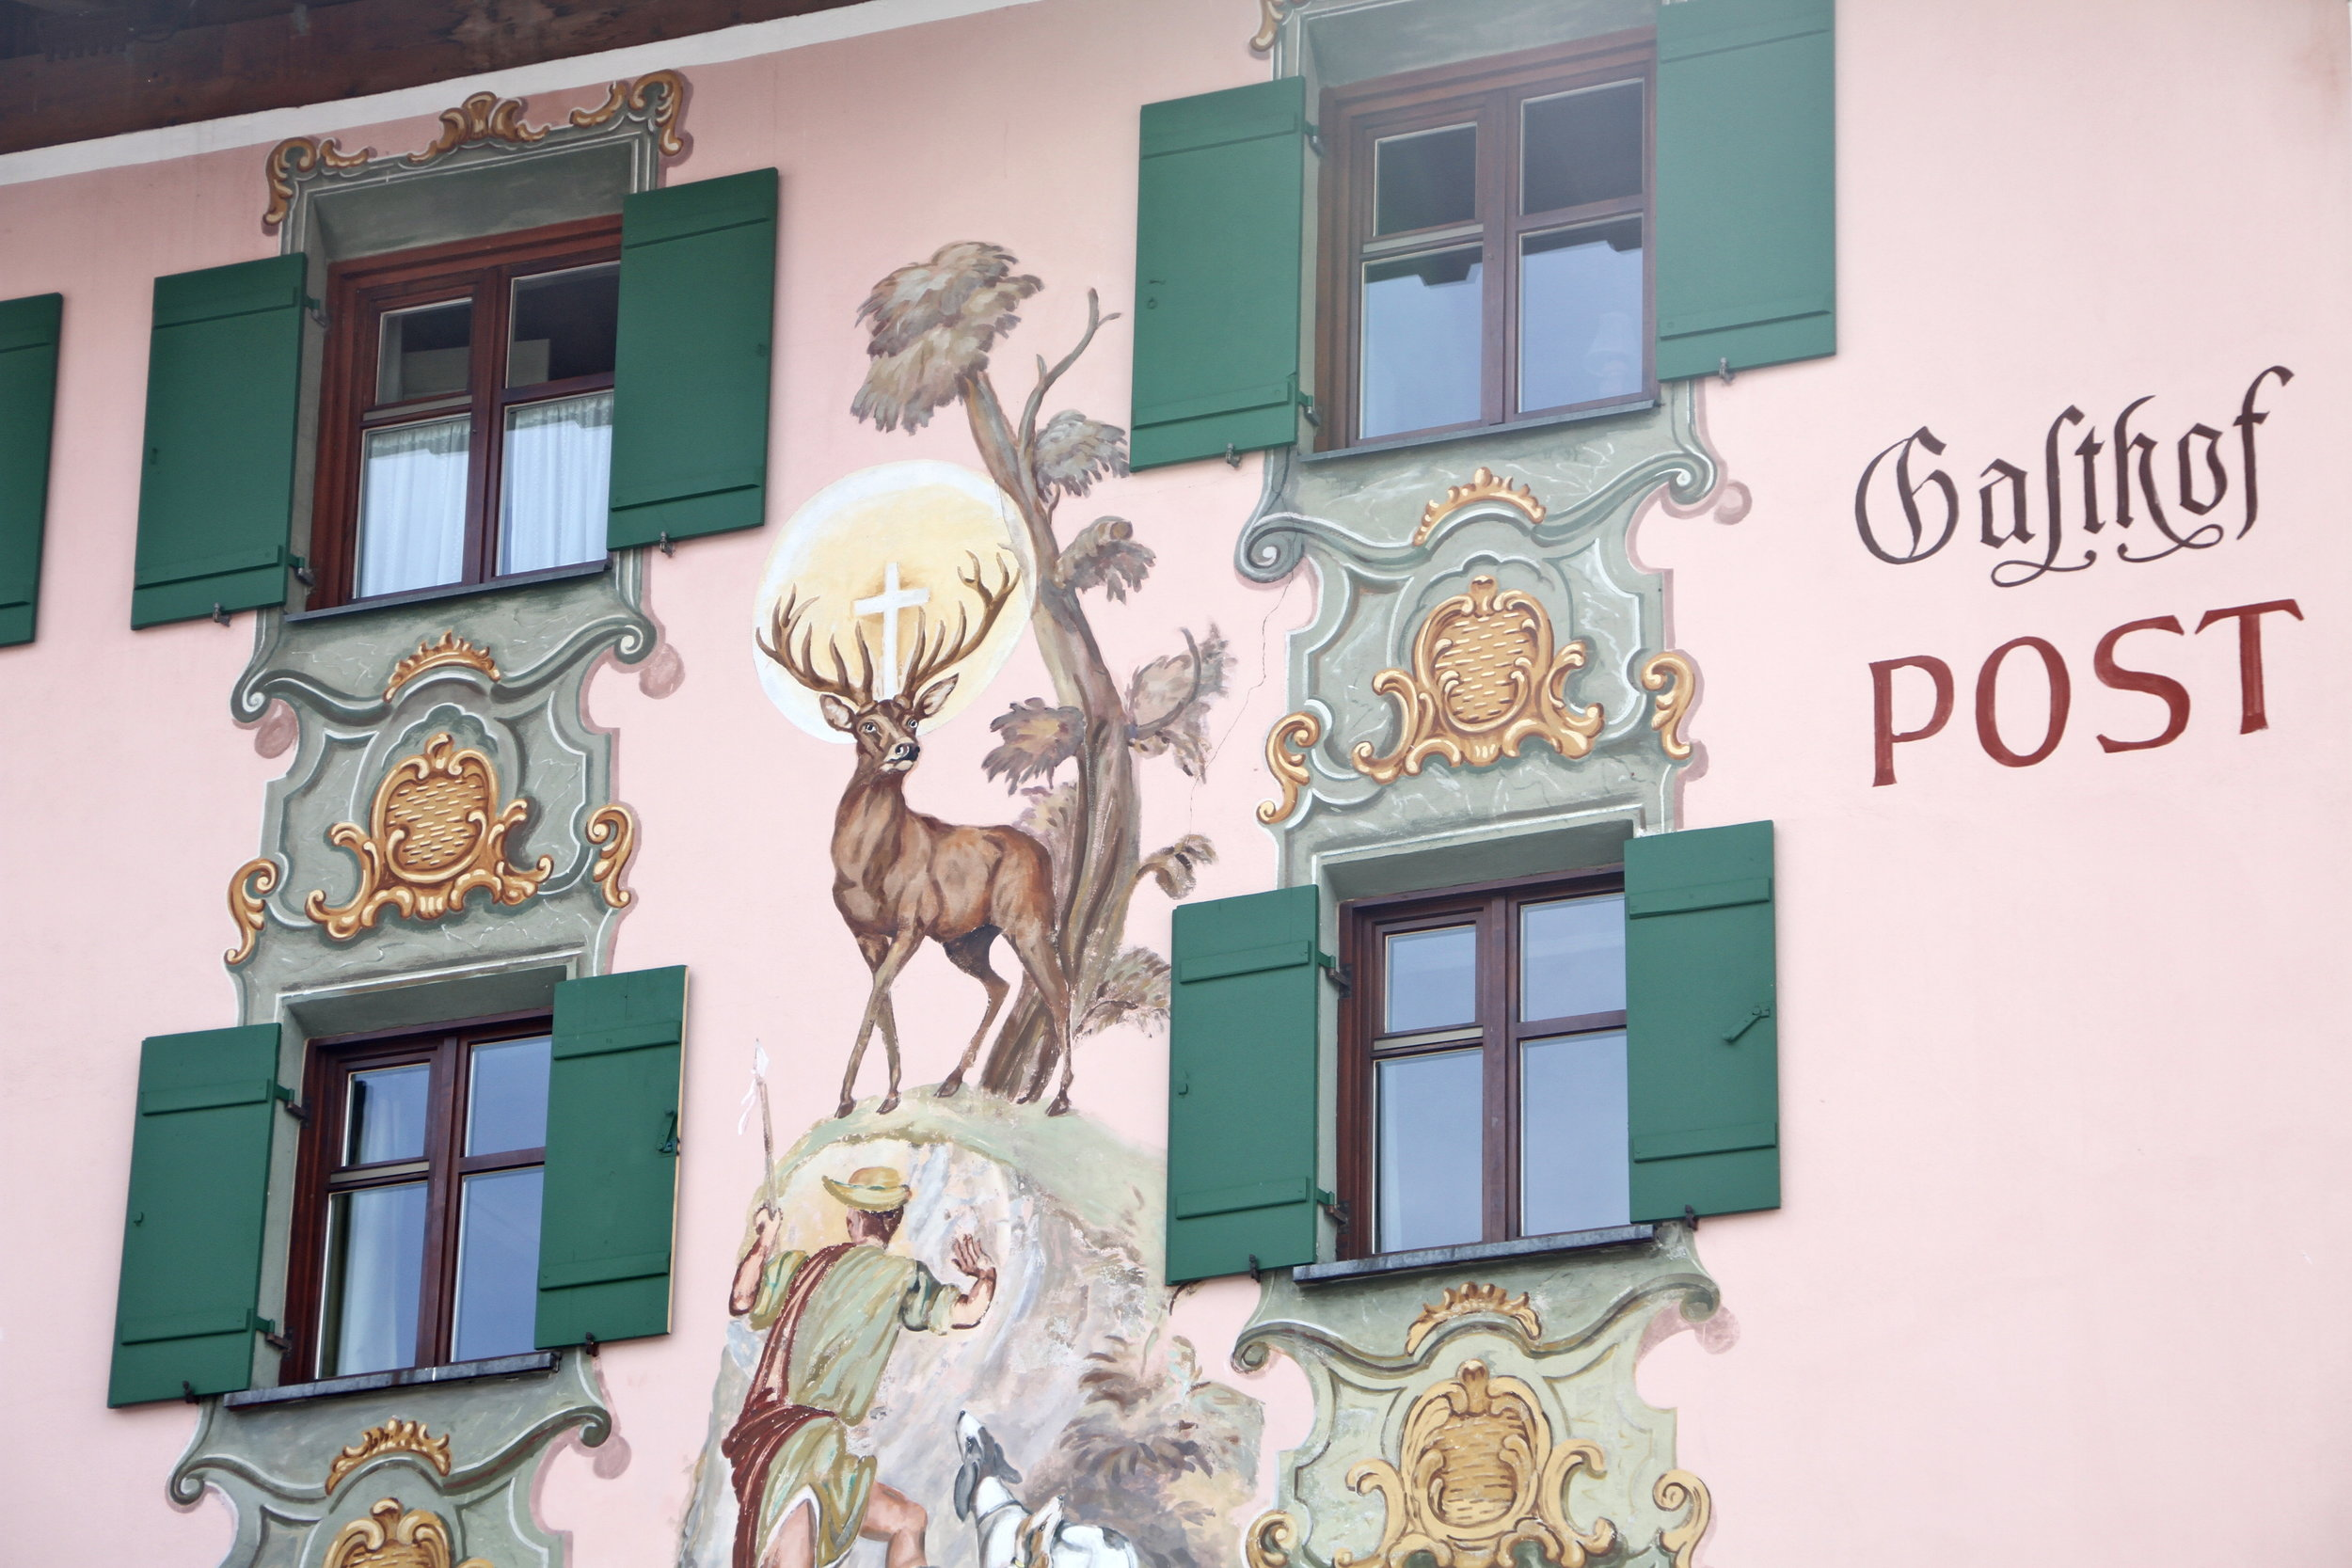 Hotel Gasthof Post, Lech, Austria.